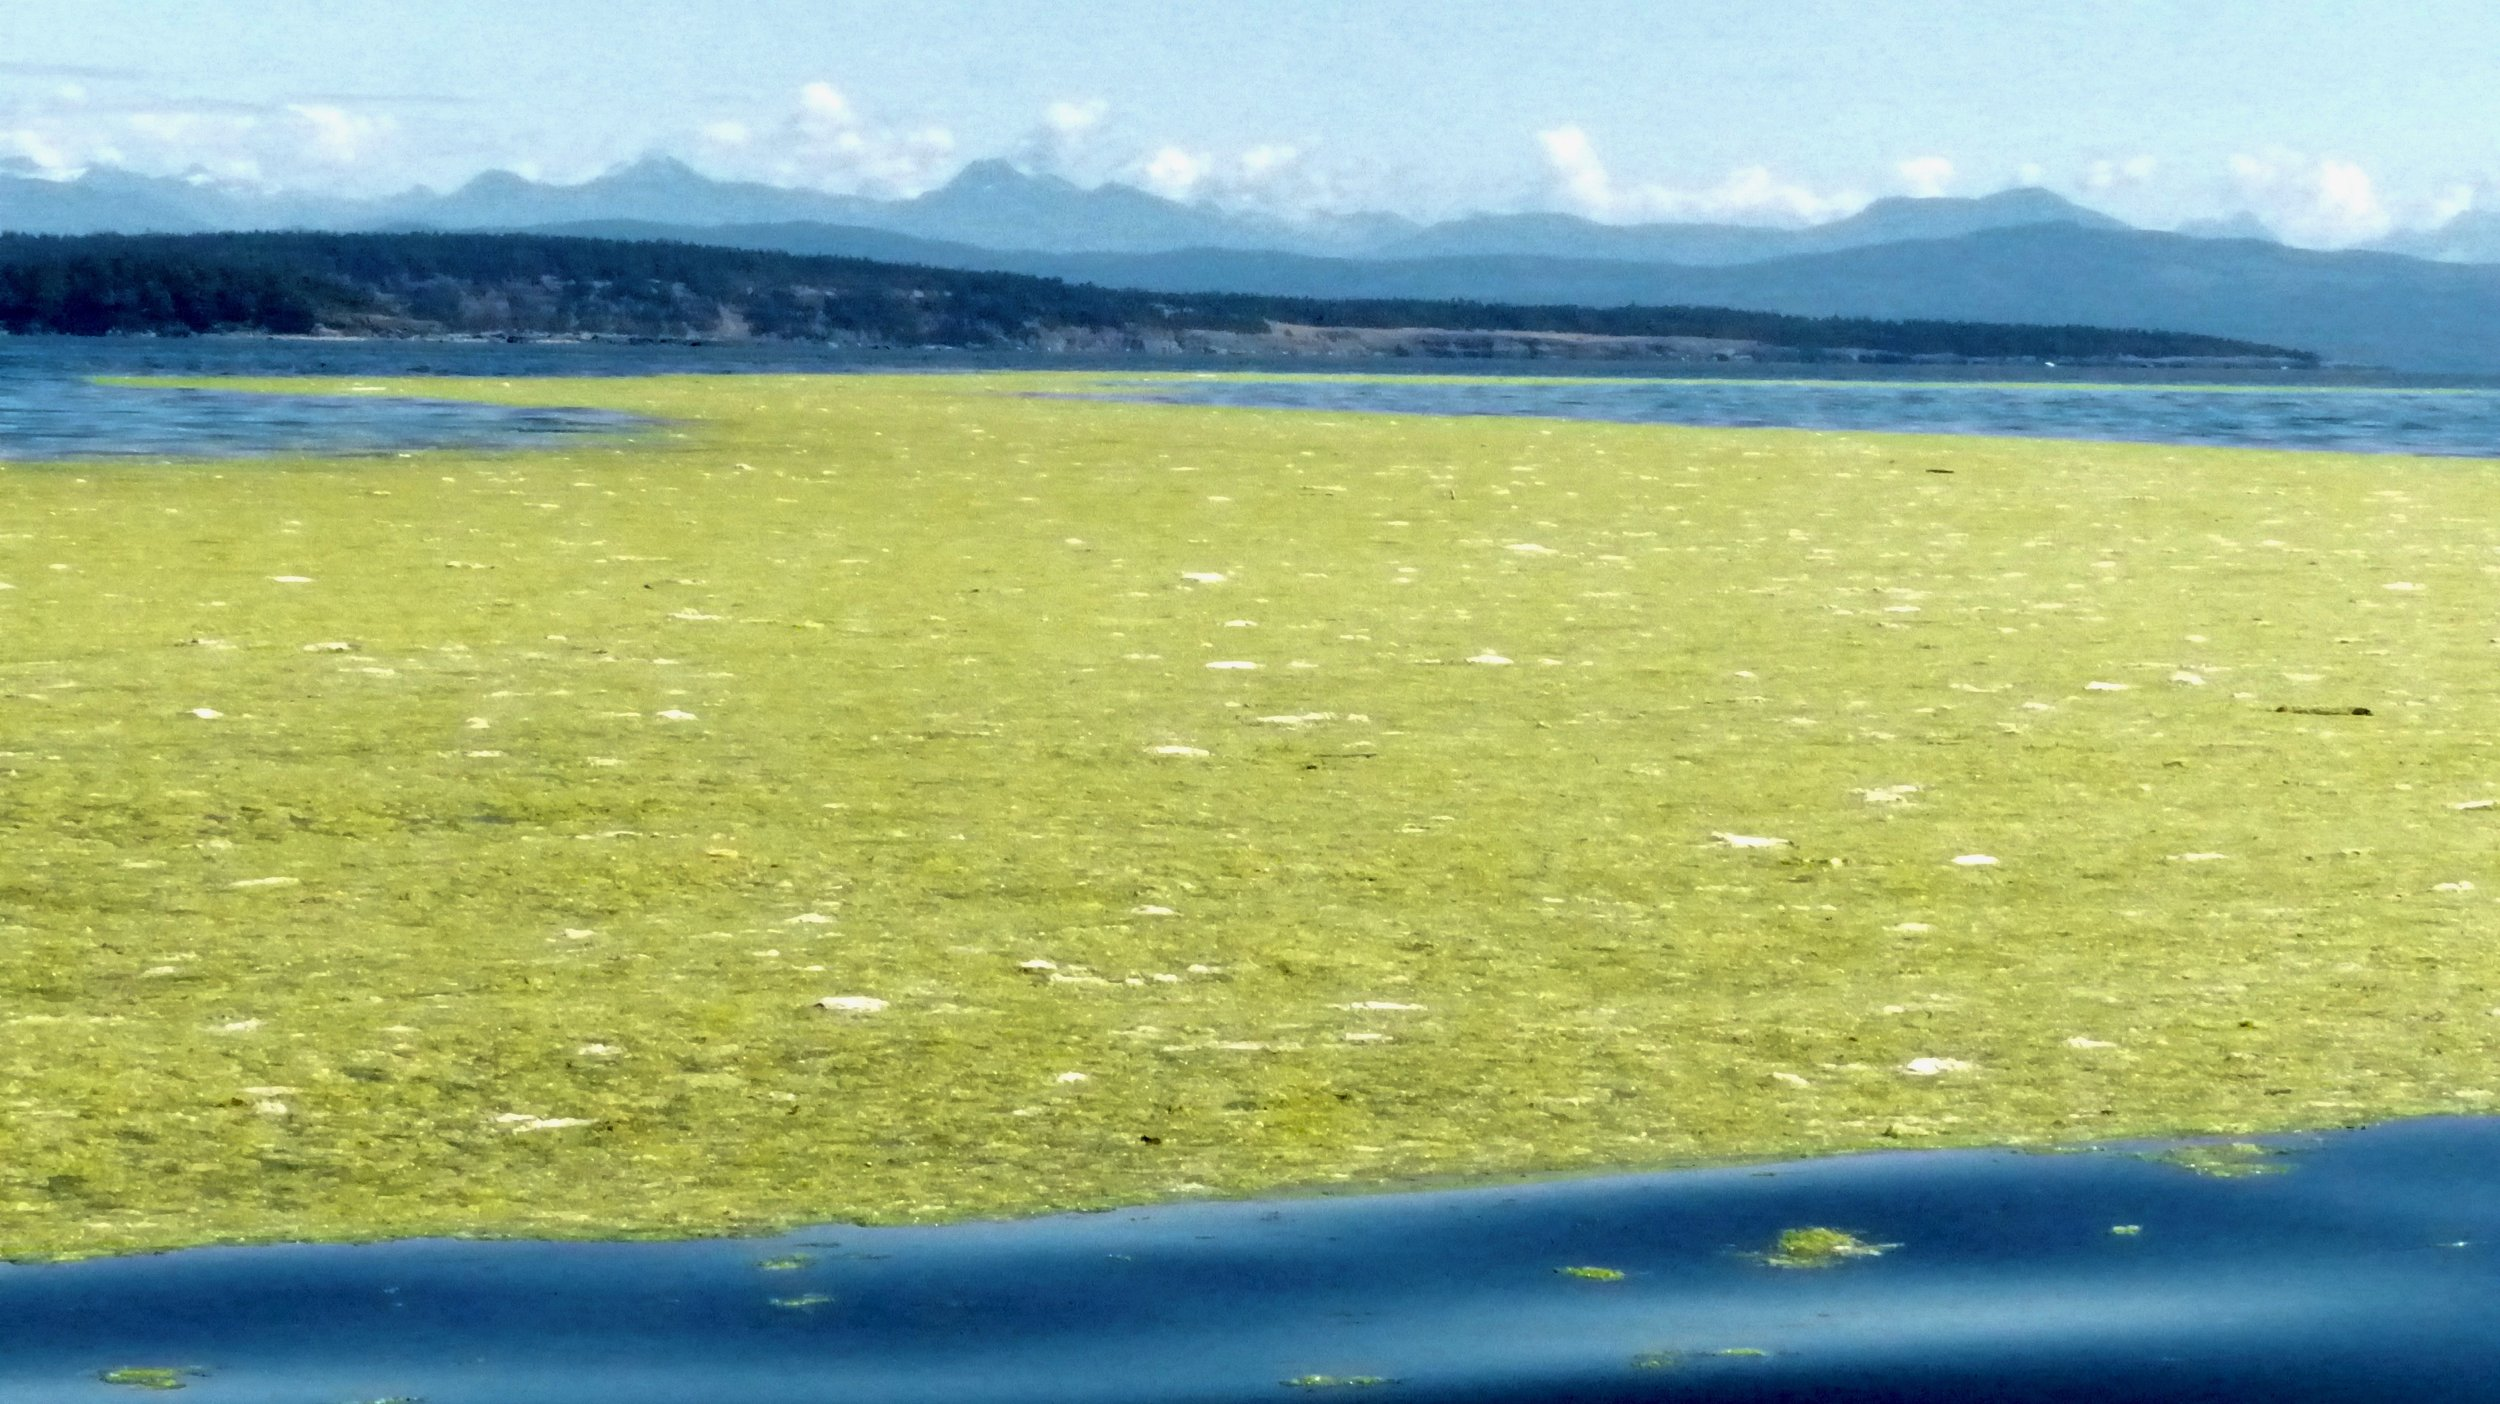 Georgia Strait Massive Algal Bloom 2016 (Photo by P. Wilcox)